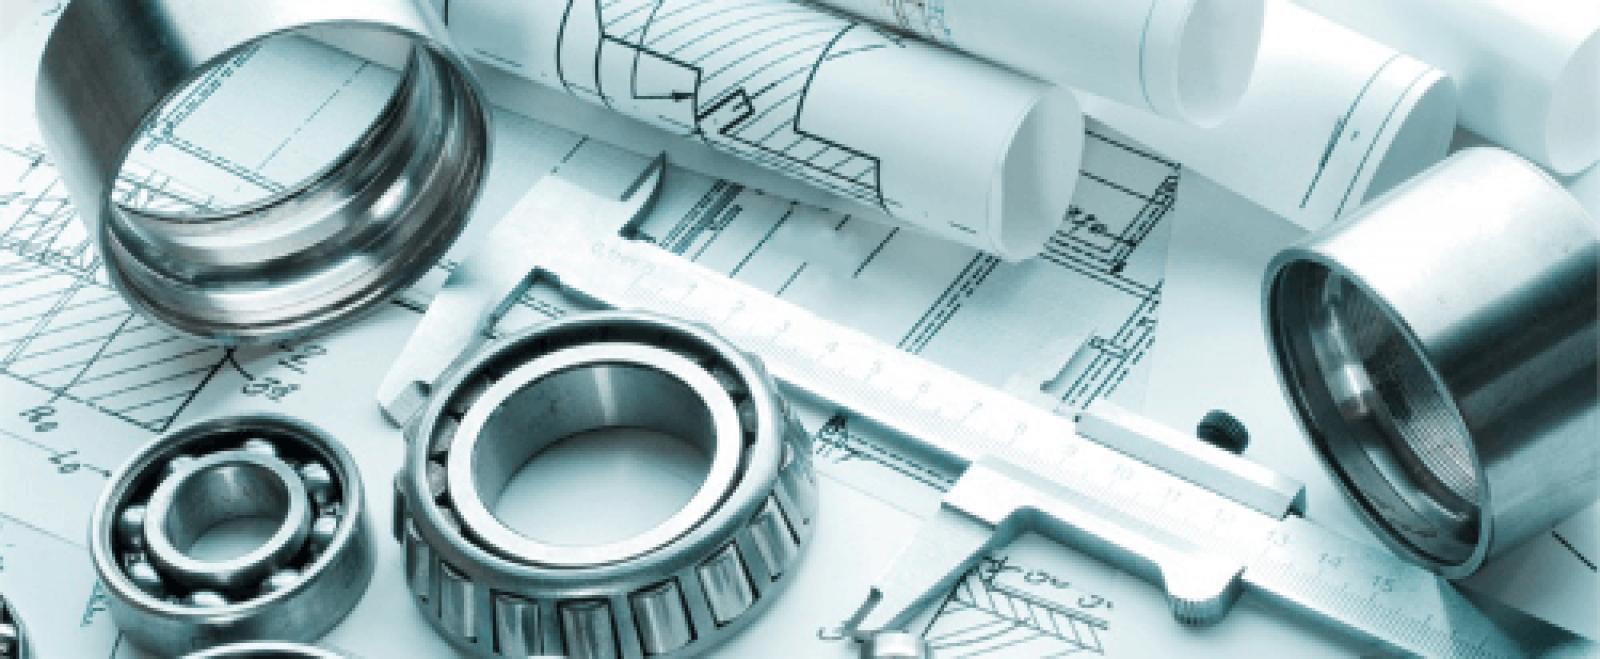 bearings-blueprints-and-measure.png